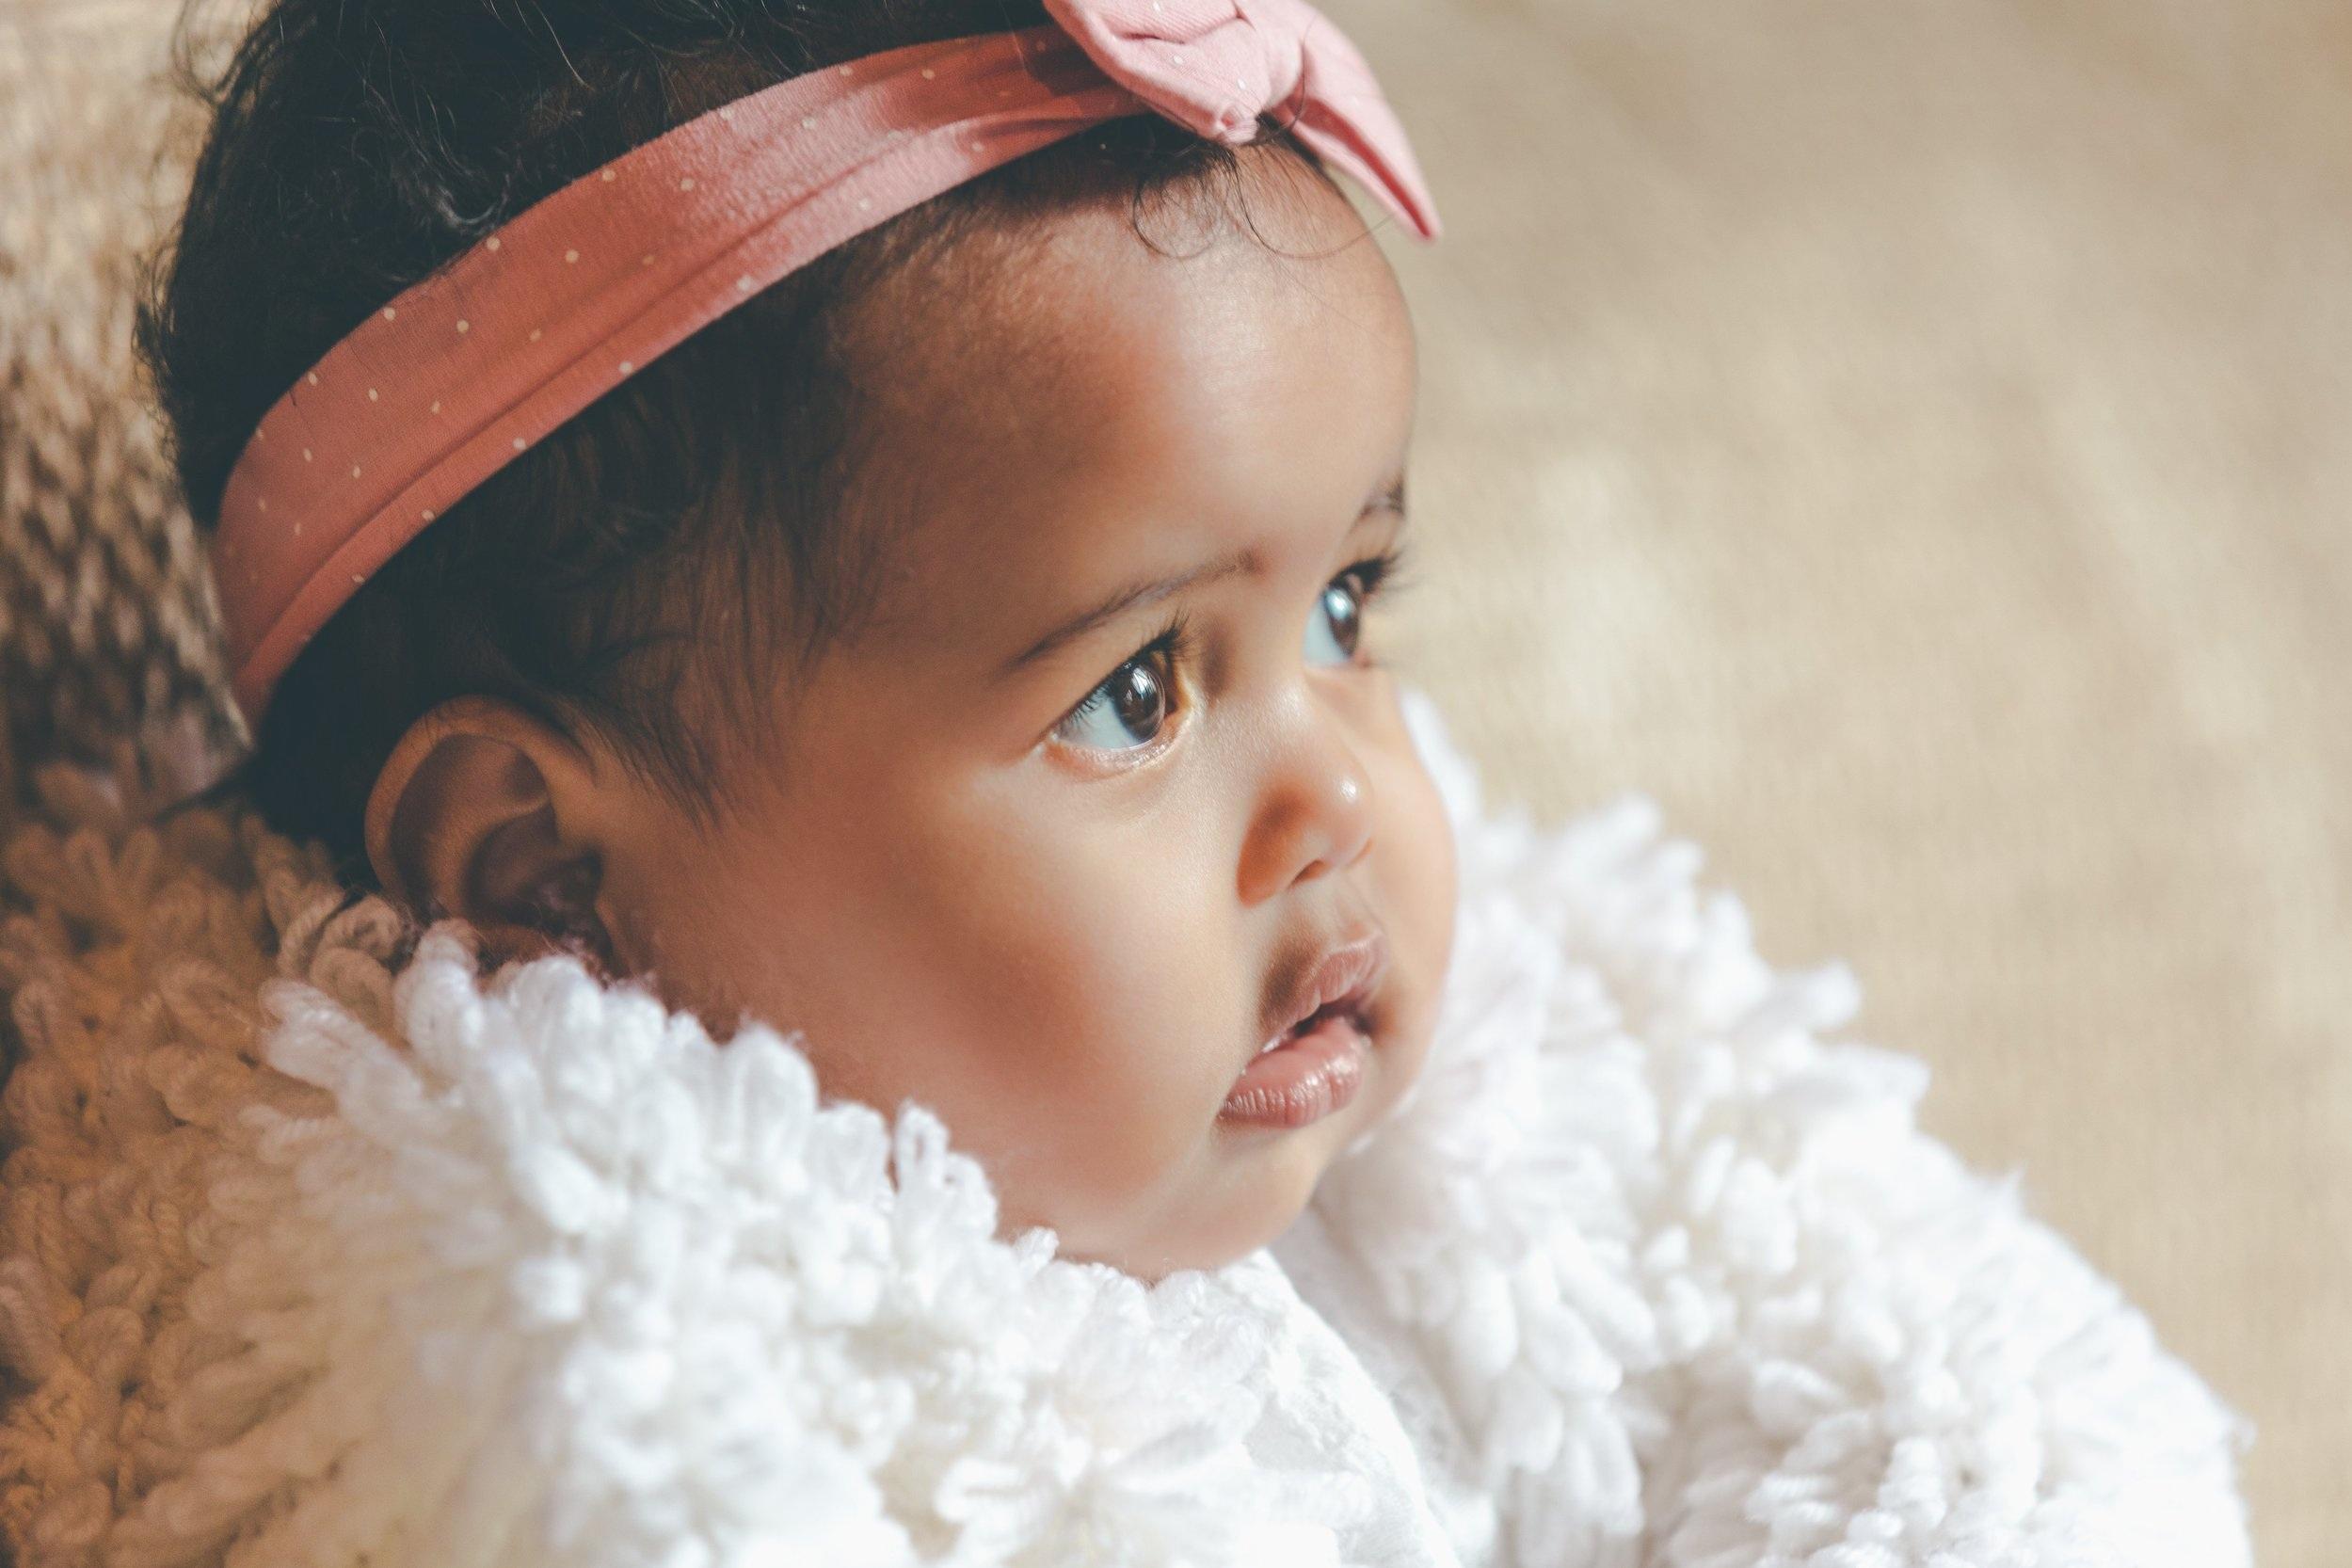 cute-baby-girl-with-pink-bow-headband.jpg